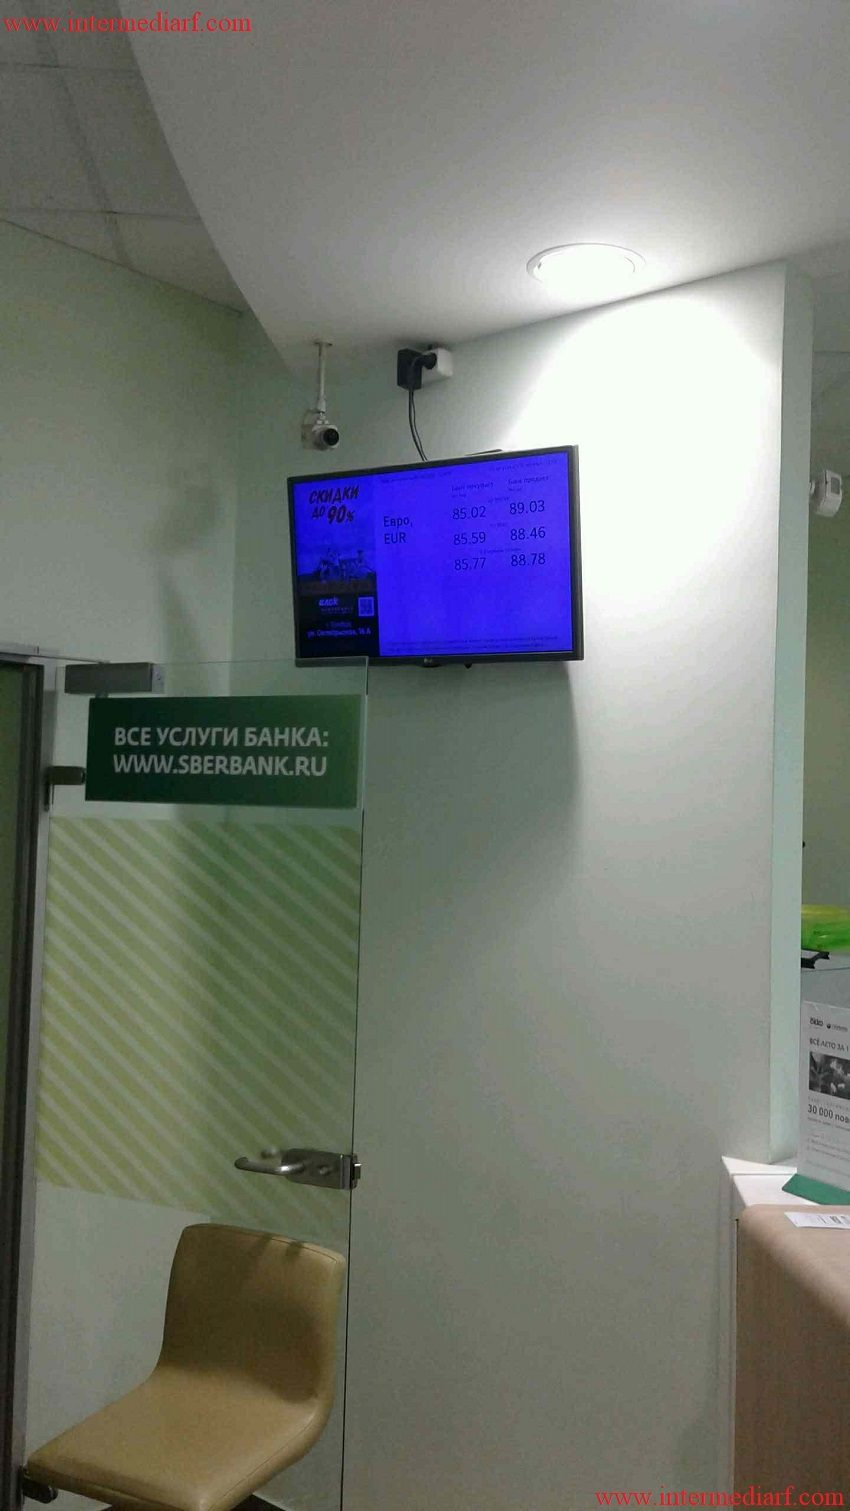 г.Тамбов, ул.СоветскаяМ.Горького, 8512